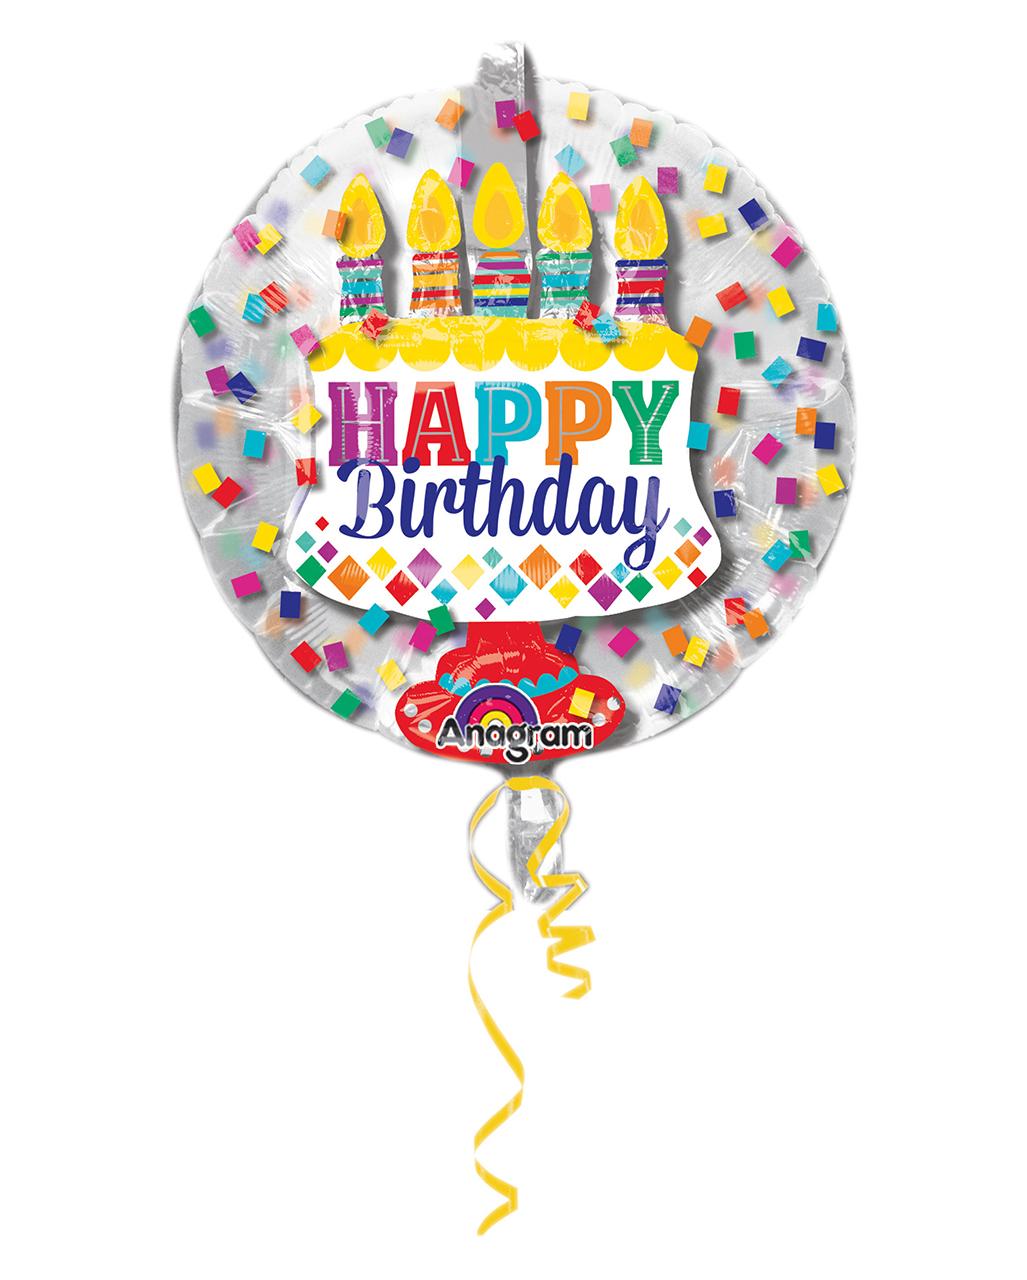 Happy Birthday Balloon In 60cm